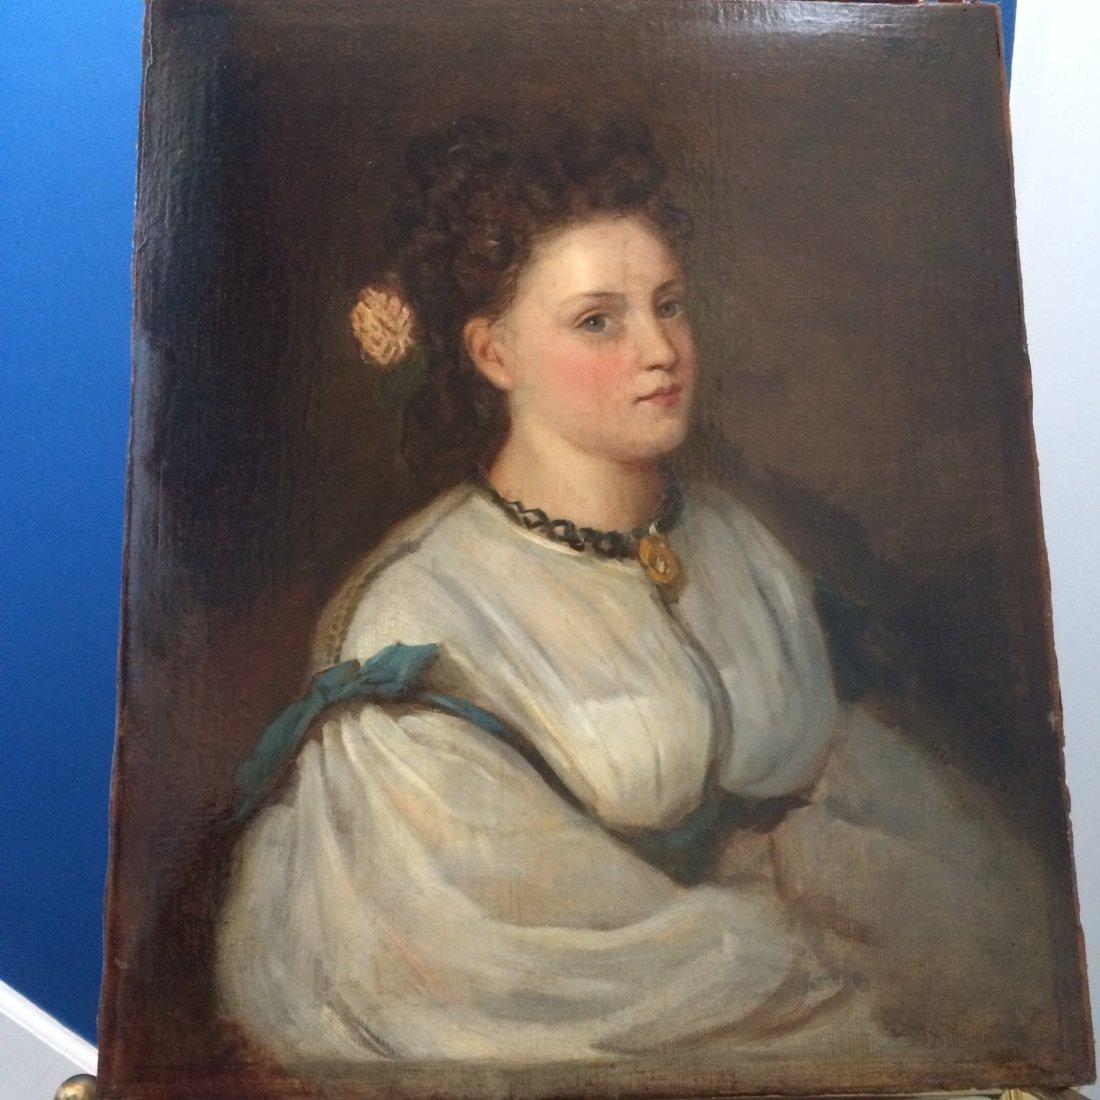 Portrait Signed Fantin. Oil on Canvas